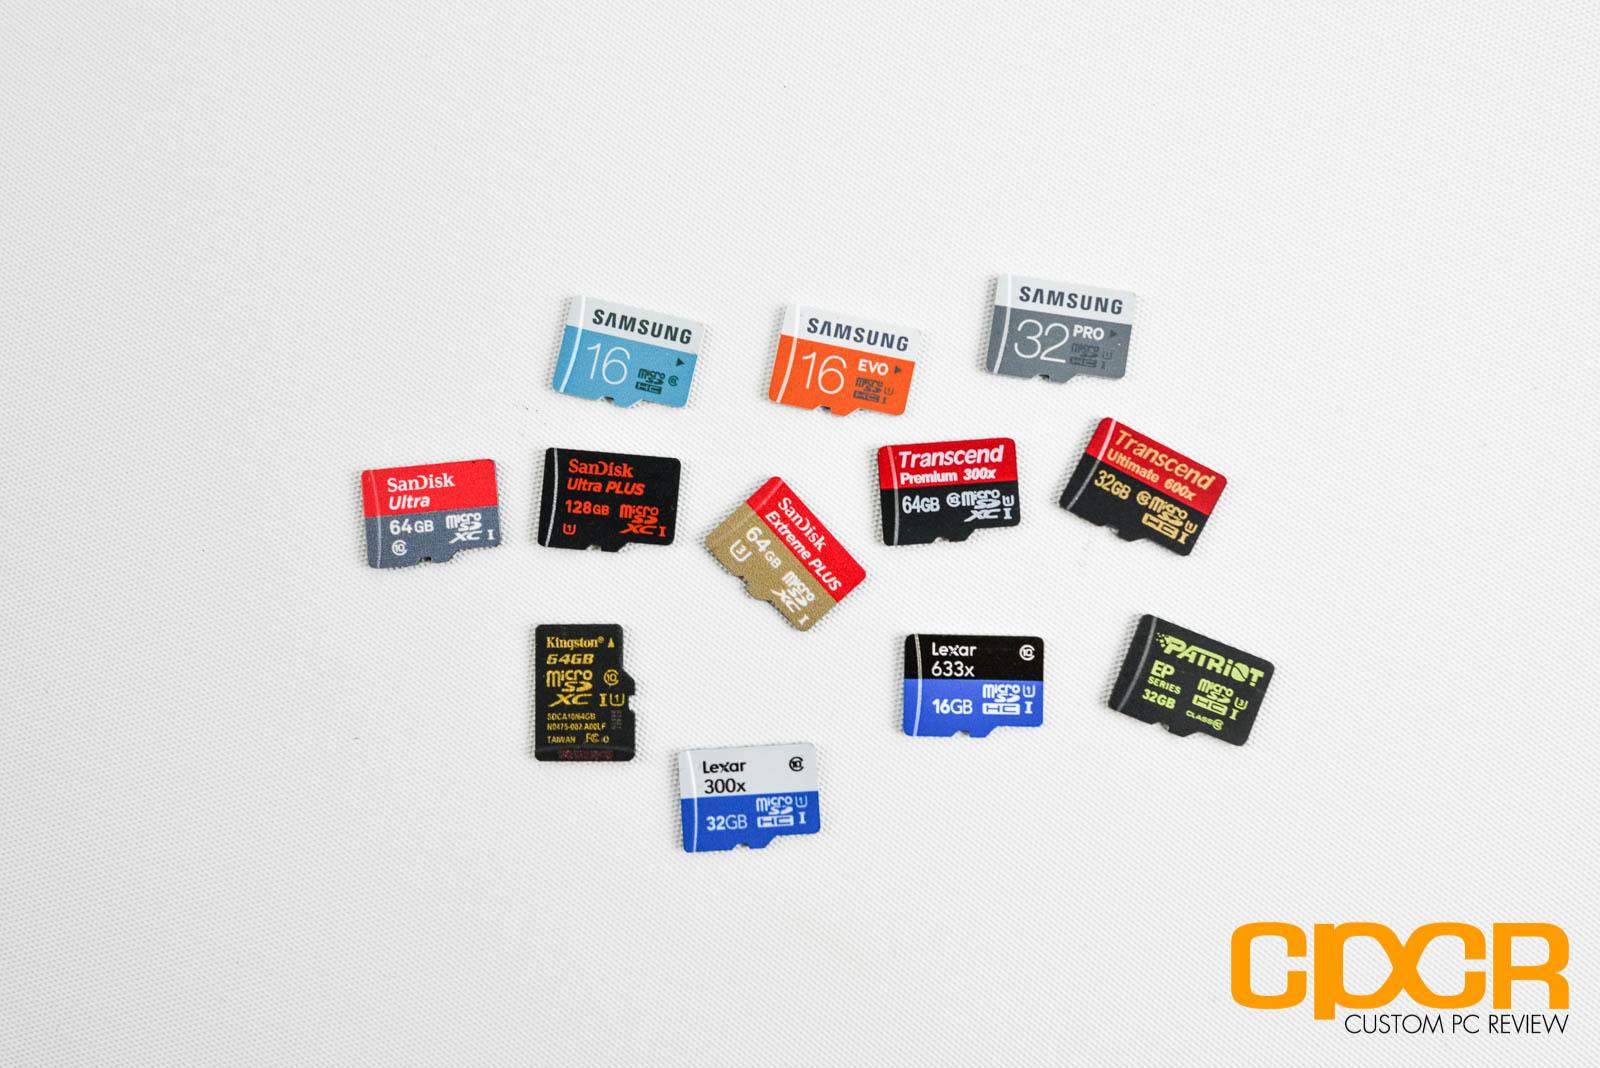 Micro Sd Karte 64gb Test.Best Microsd Card Review 12 Microsd Card Comparison Custom Pc Review